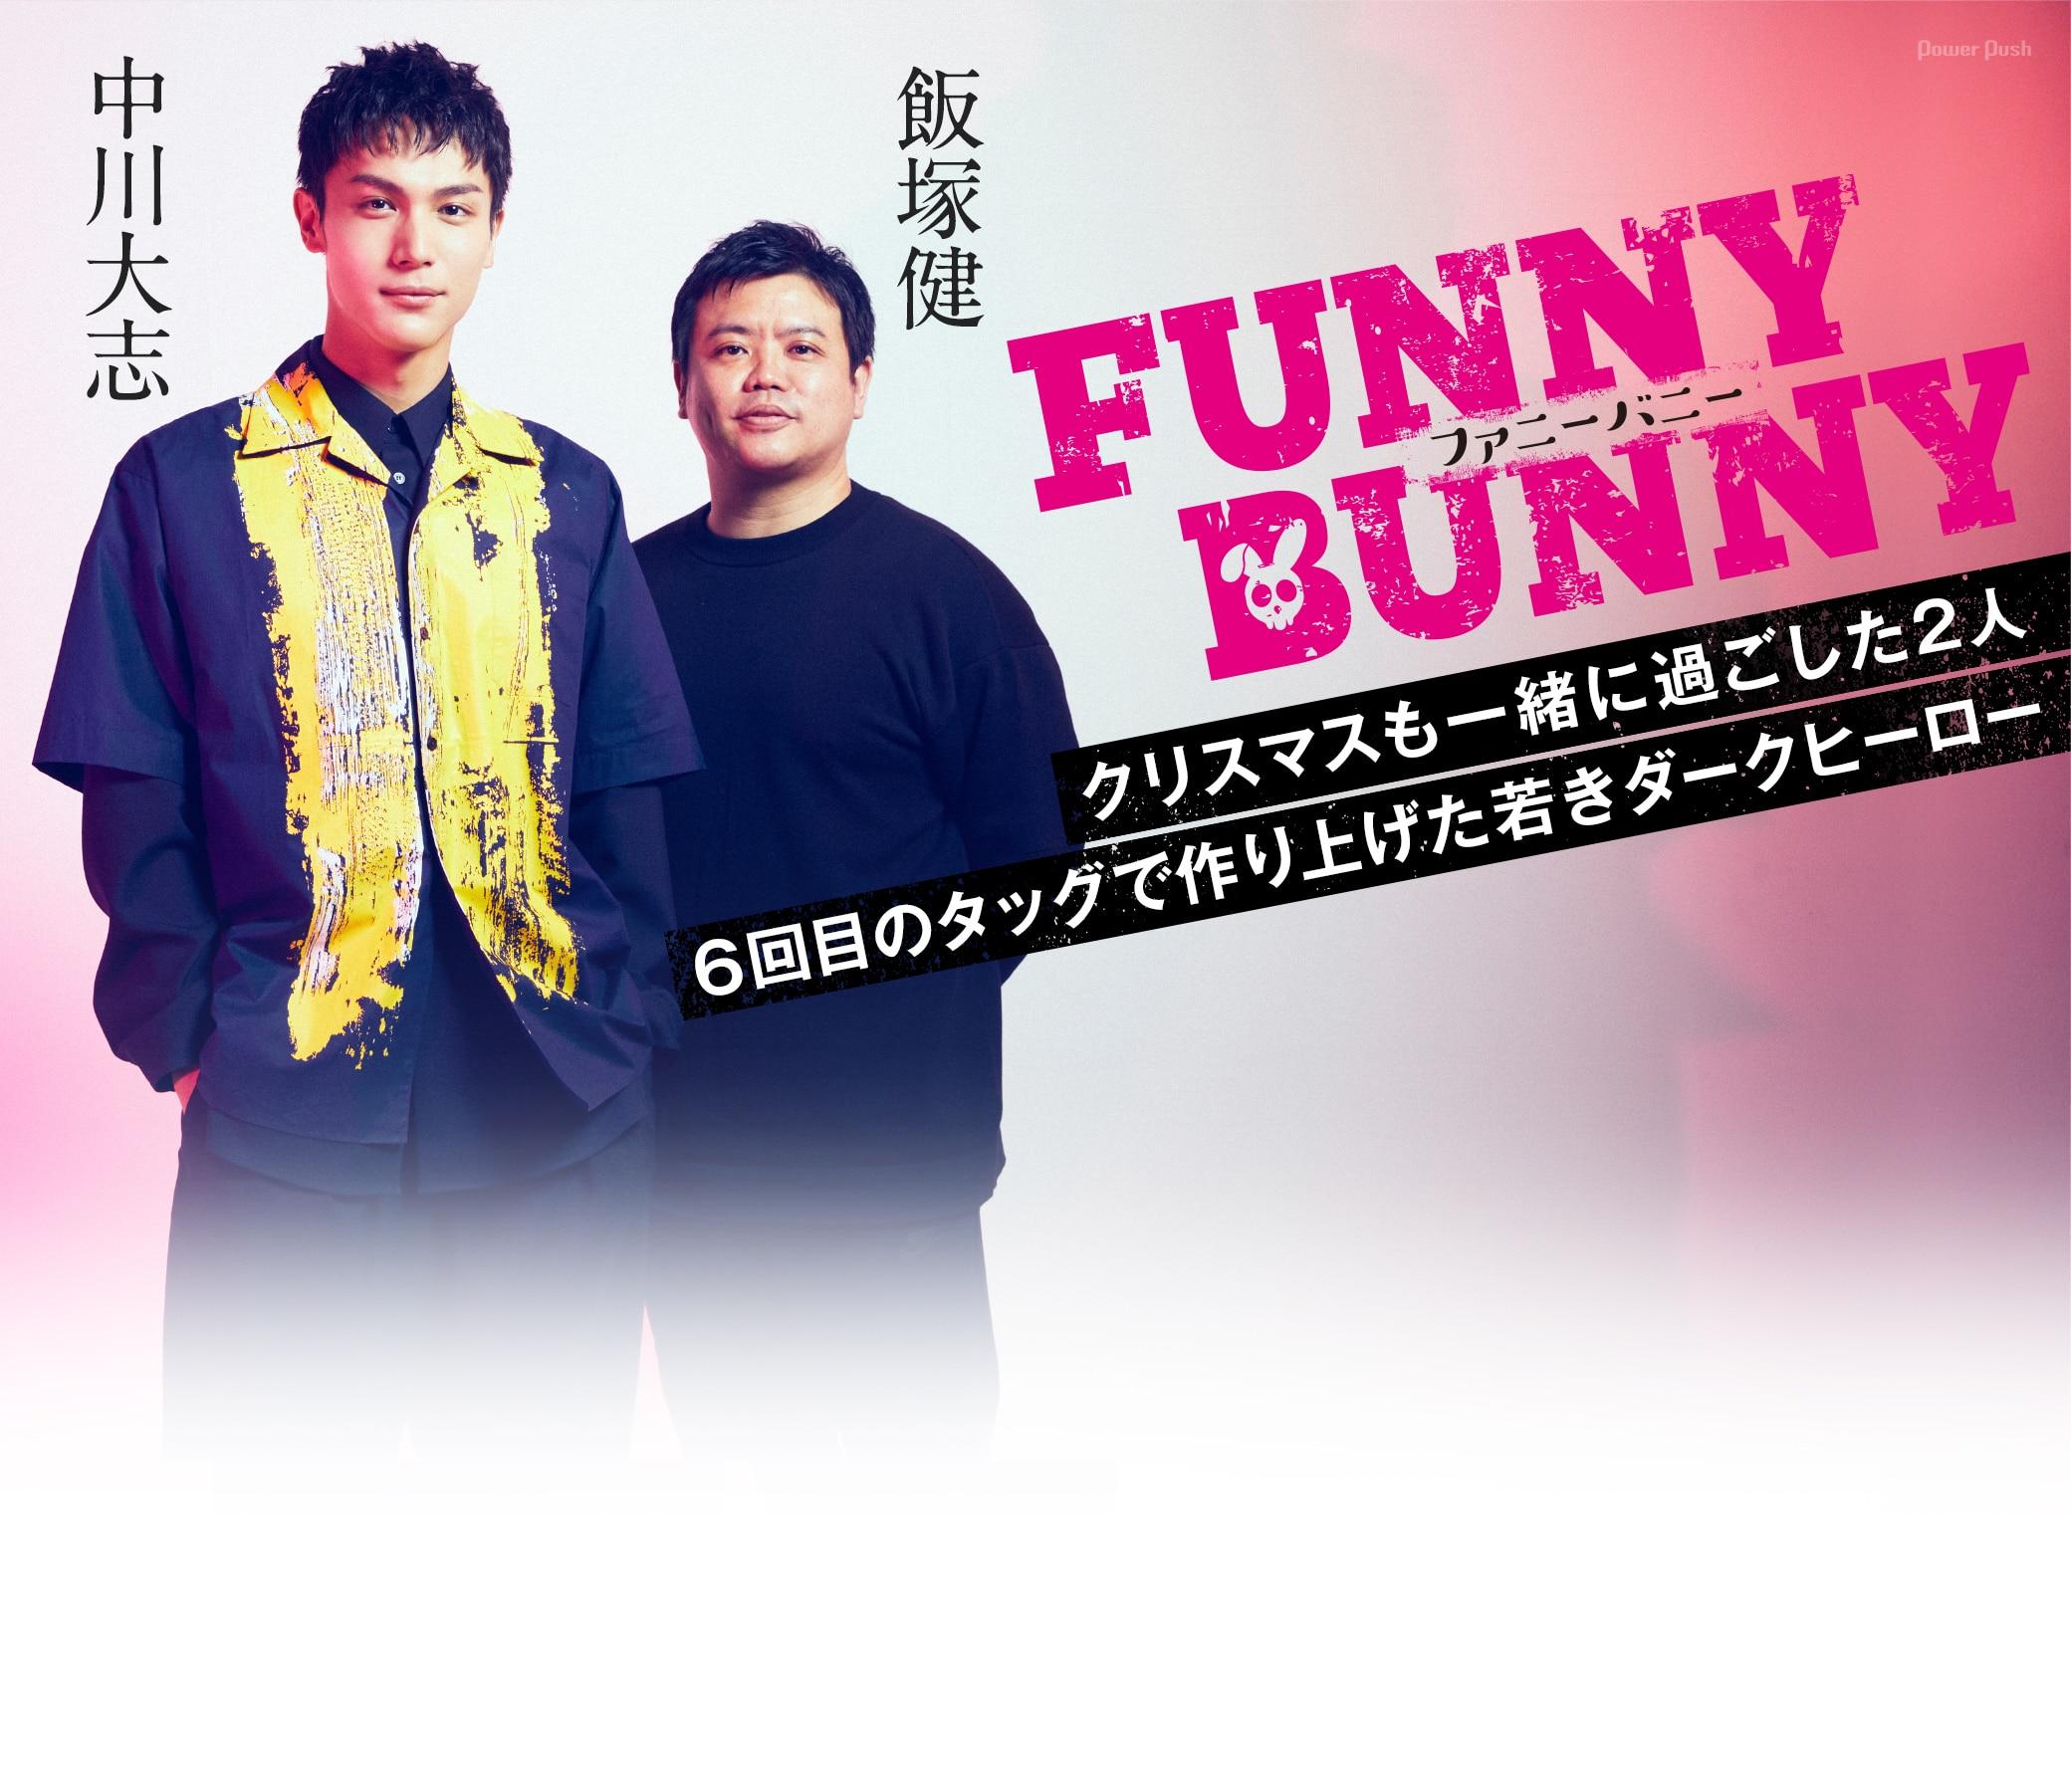 「FUNNY BUNNY」中川大志 飯塚健|クリスマスも一緒に過ごした2人 6回目のタッグで作り上げた若きダークヒーロー